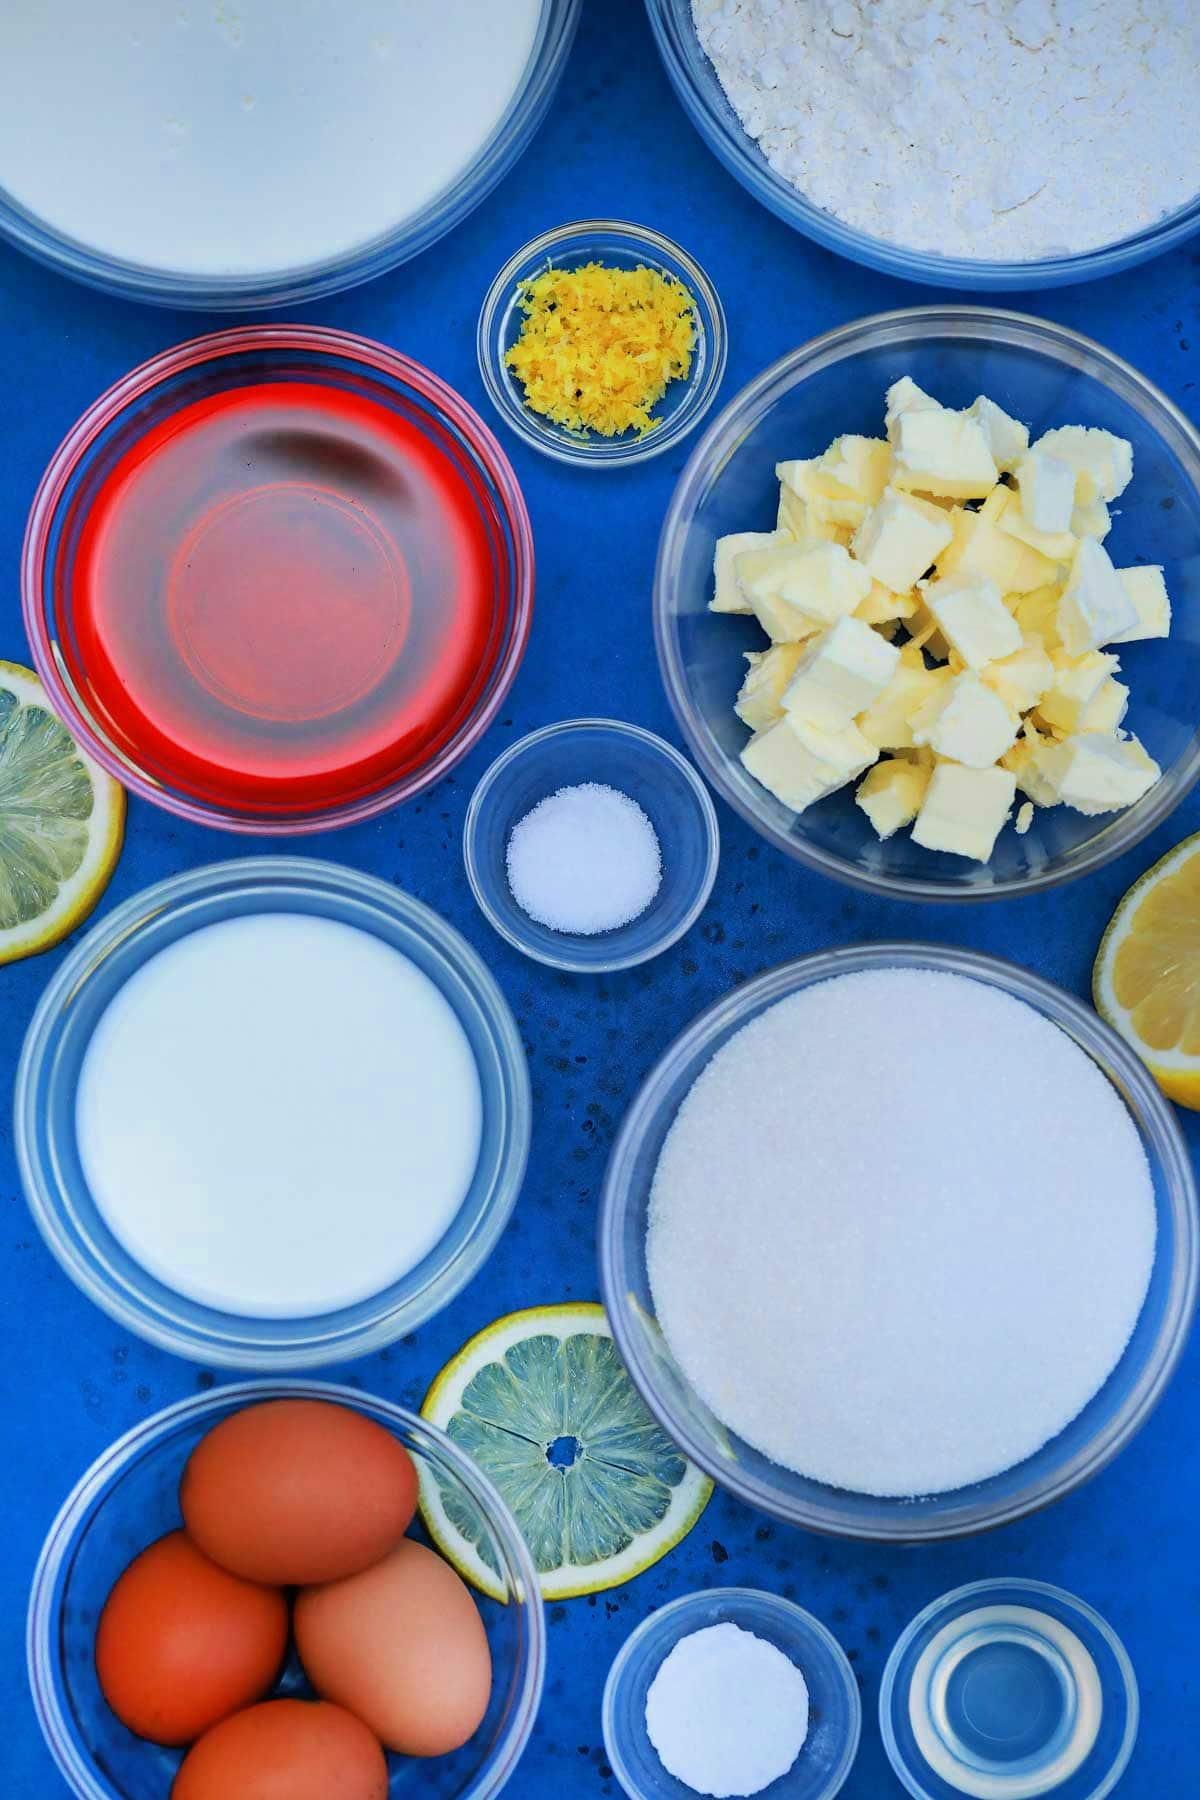 Ingredients for pink lemonade cake